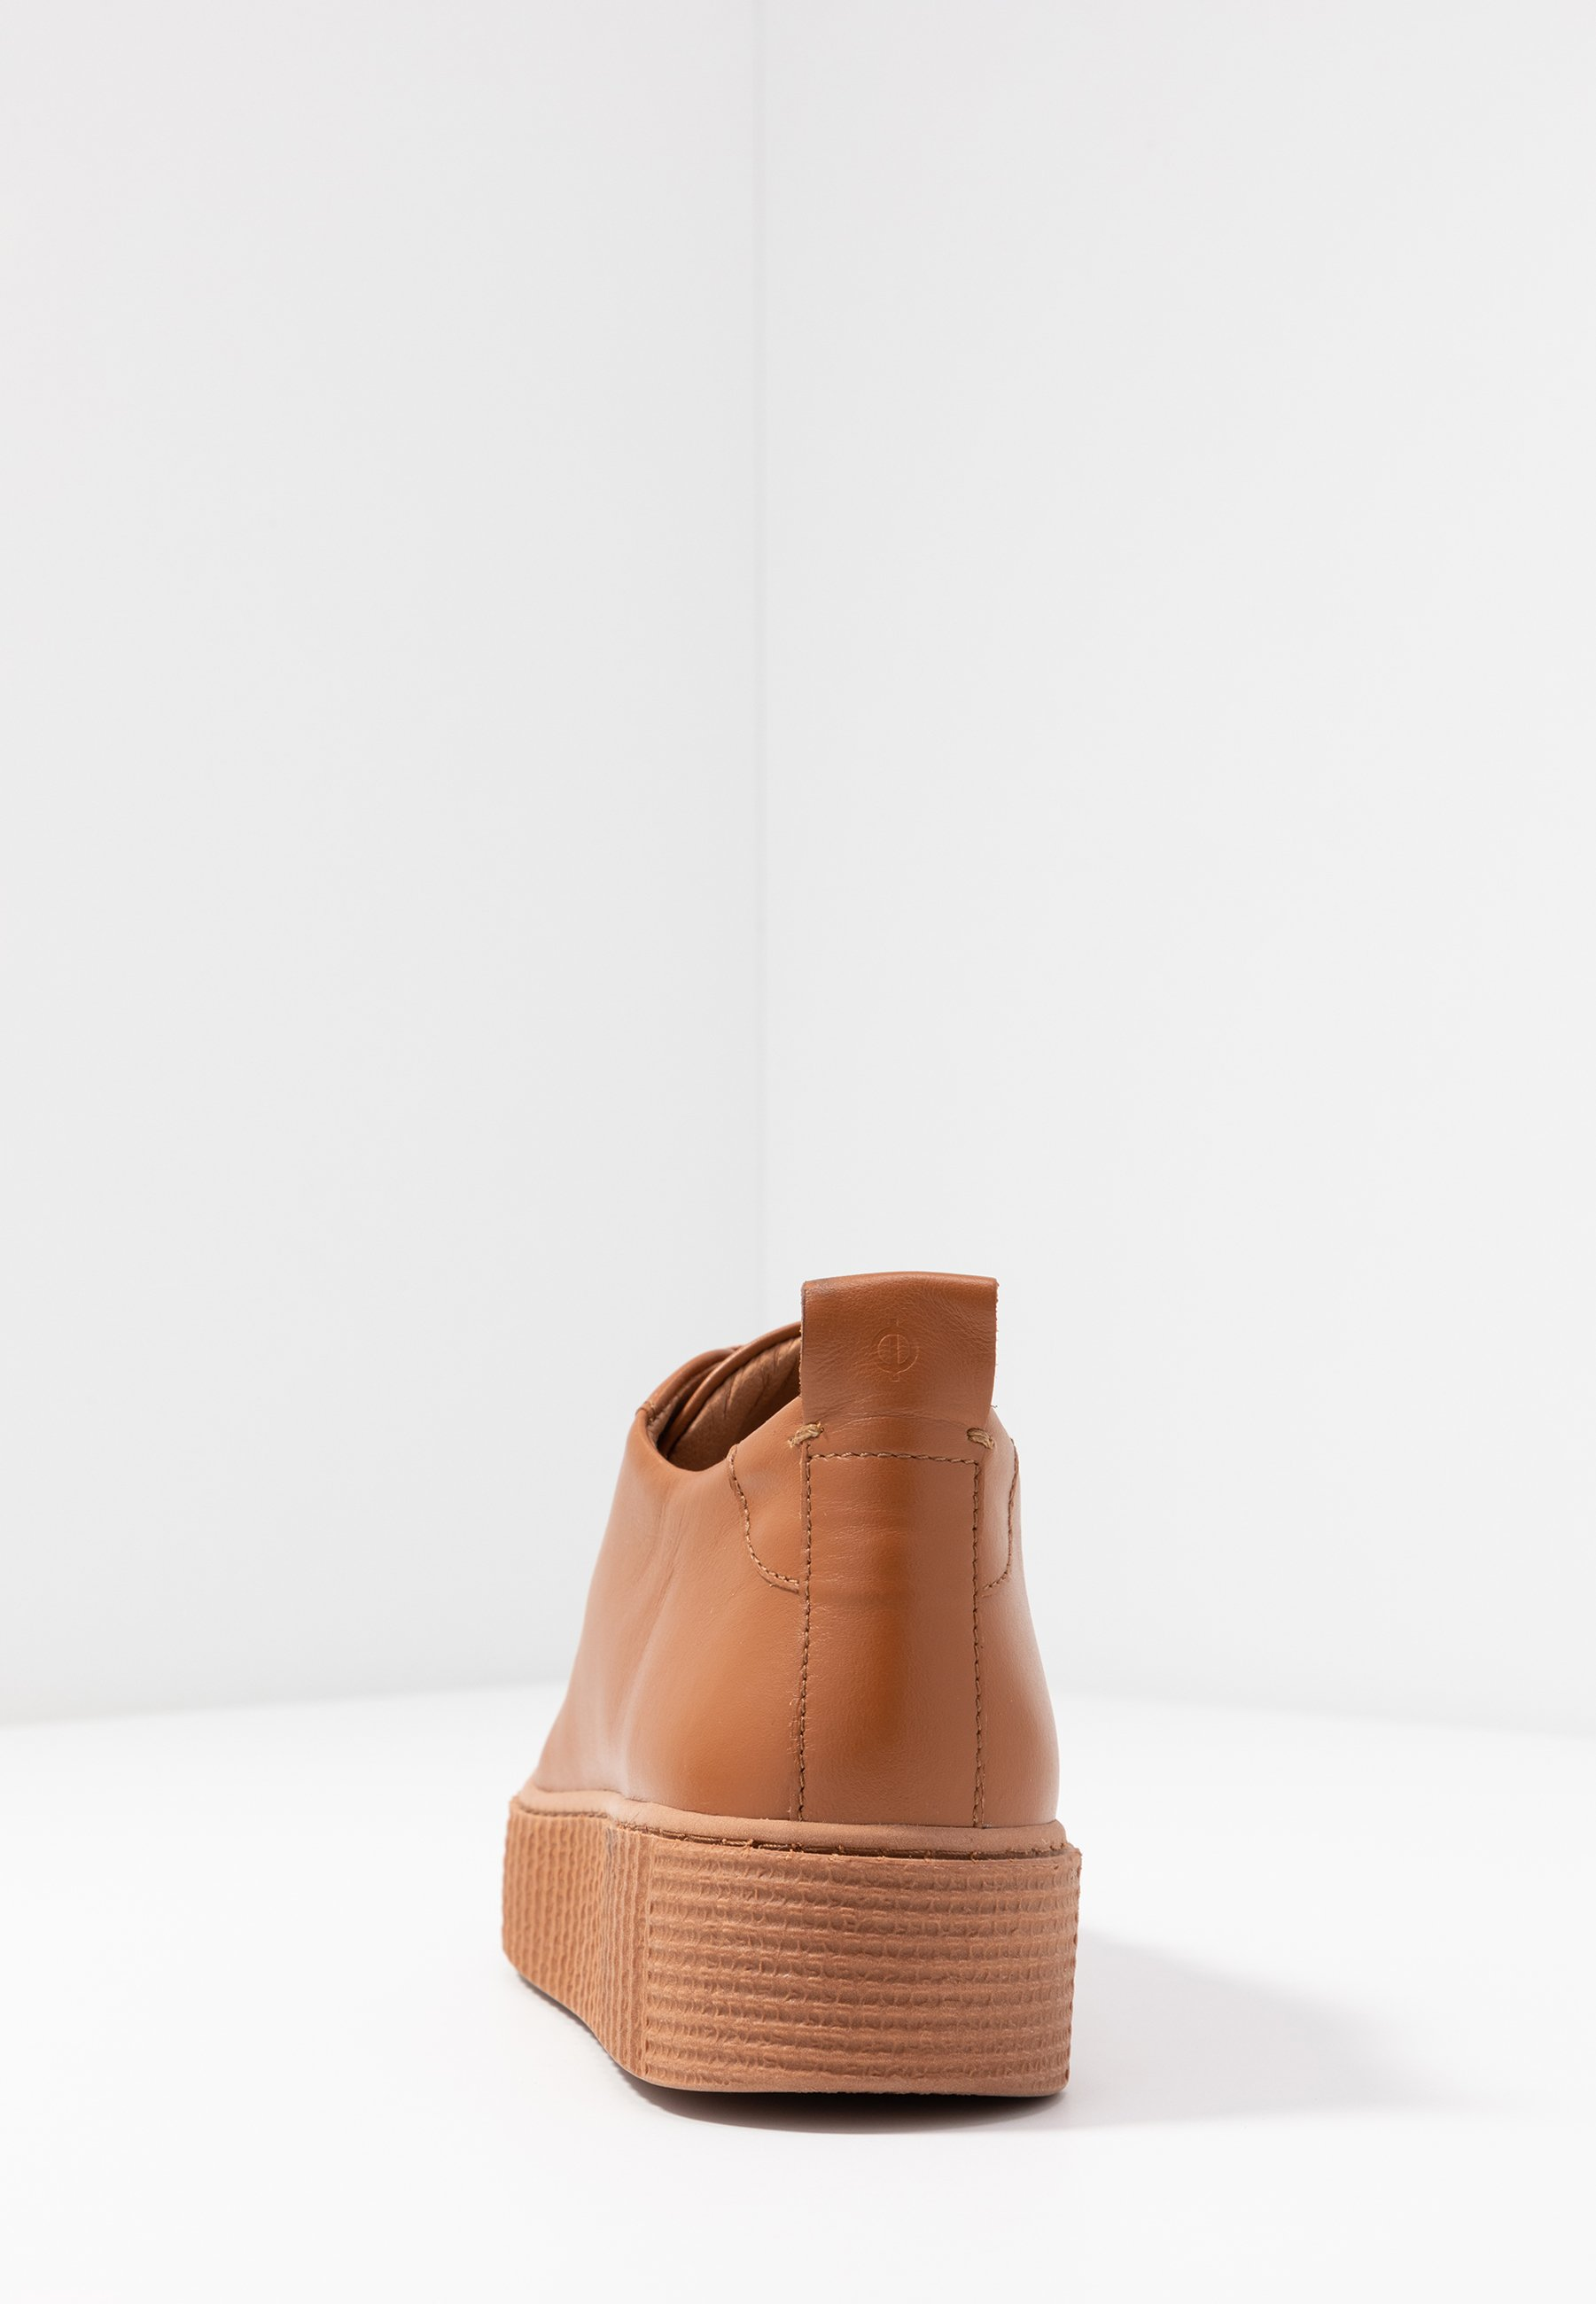 Samsøe burmel - Sneakers Coganc